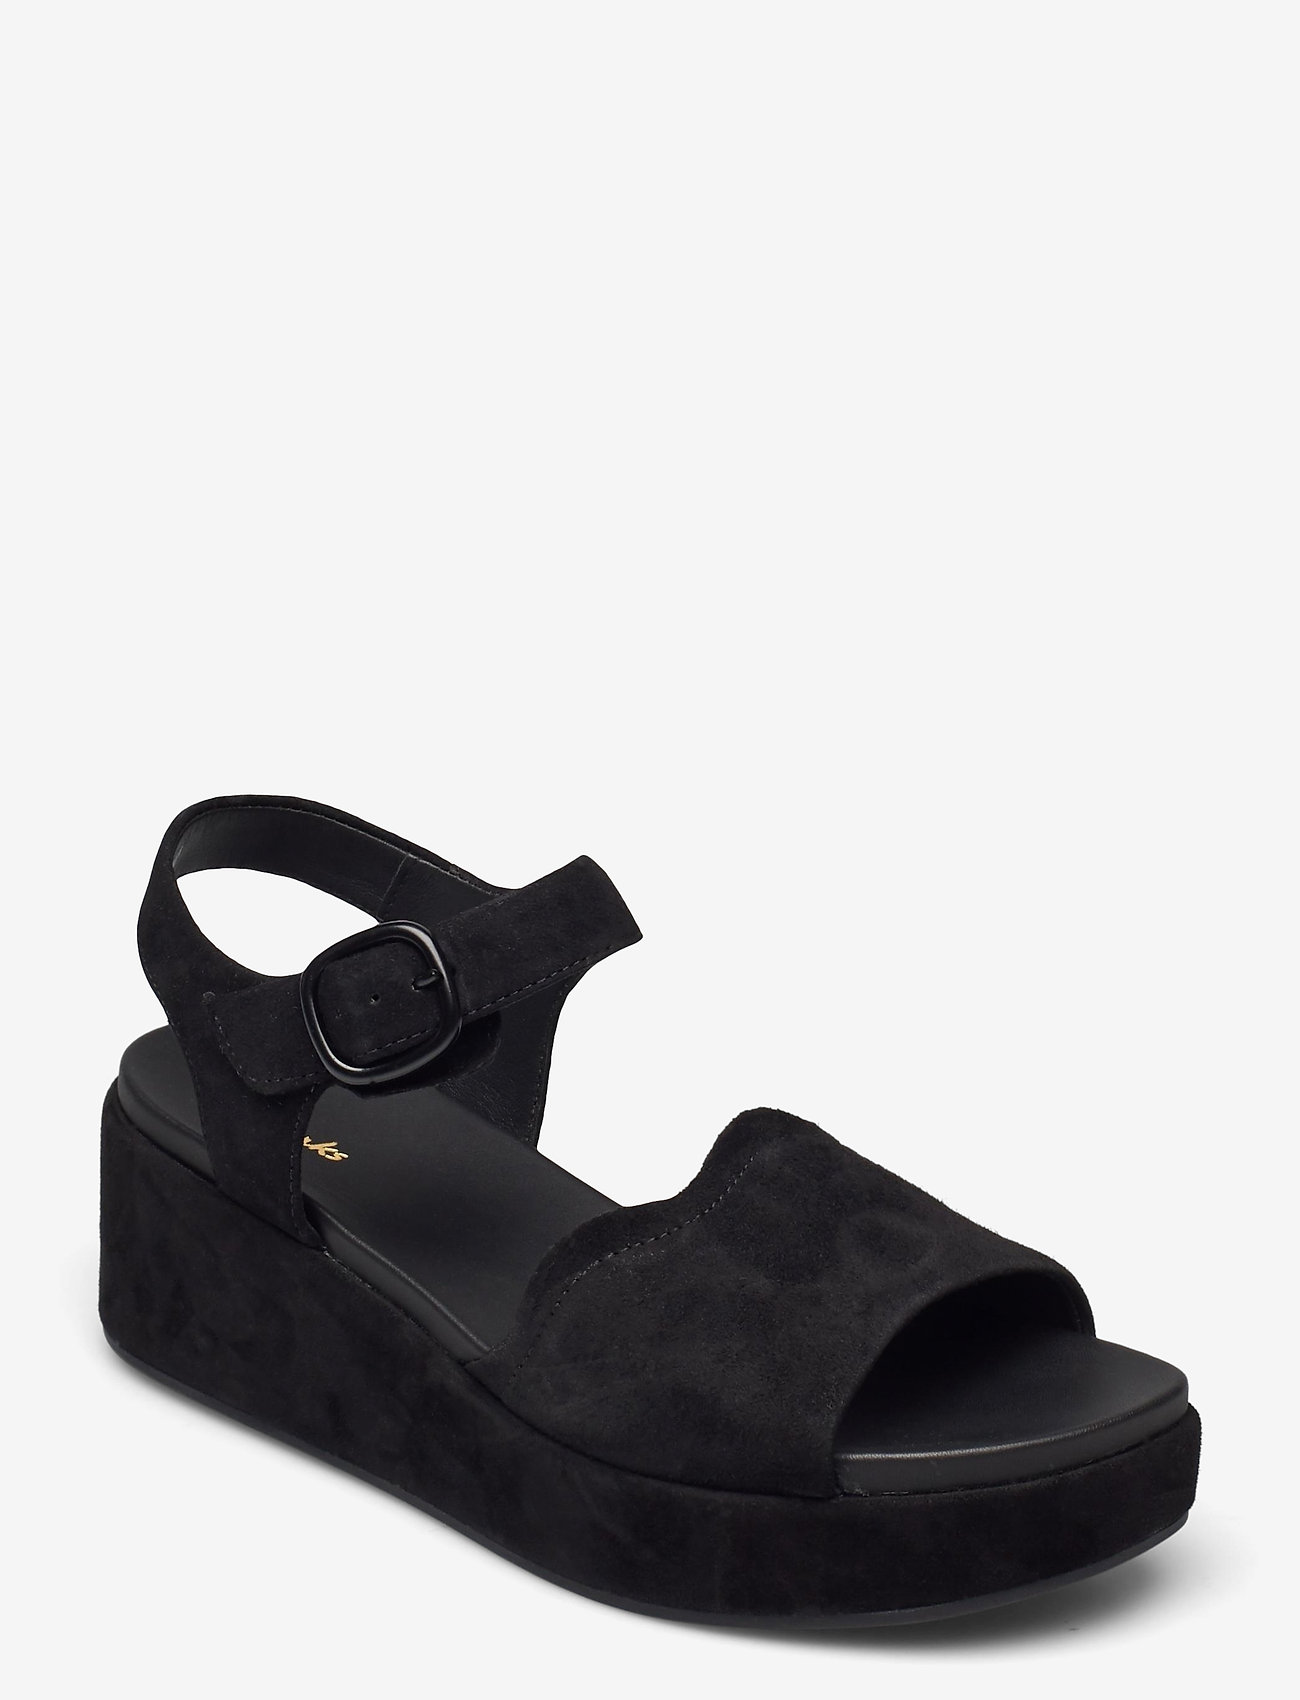 Clarks - Kimmei Way - platta sandaler - black sde - 0